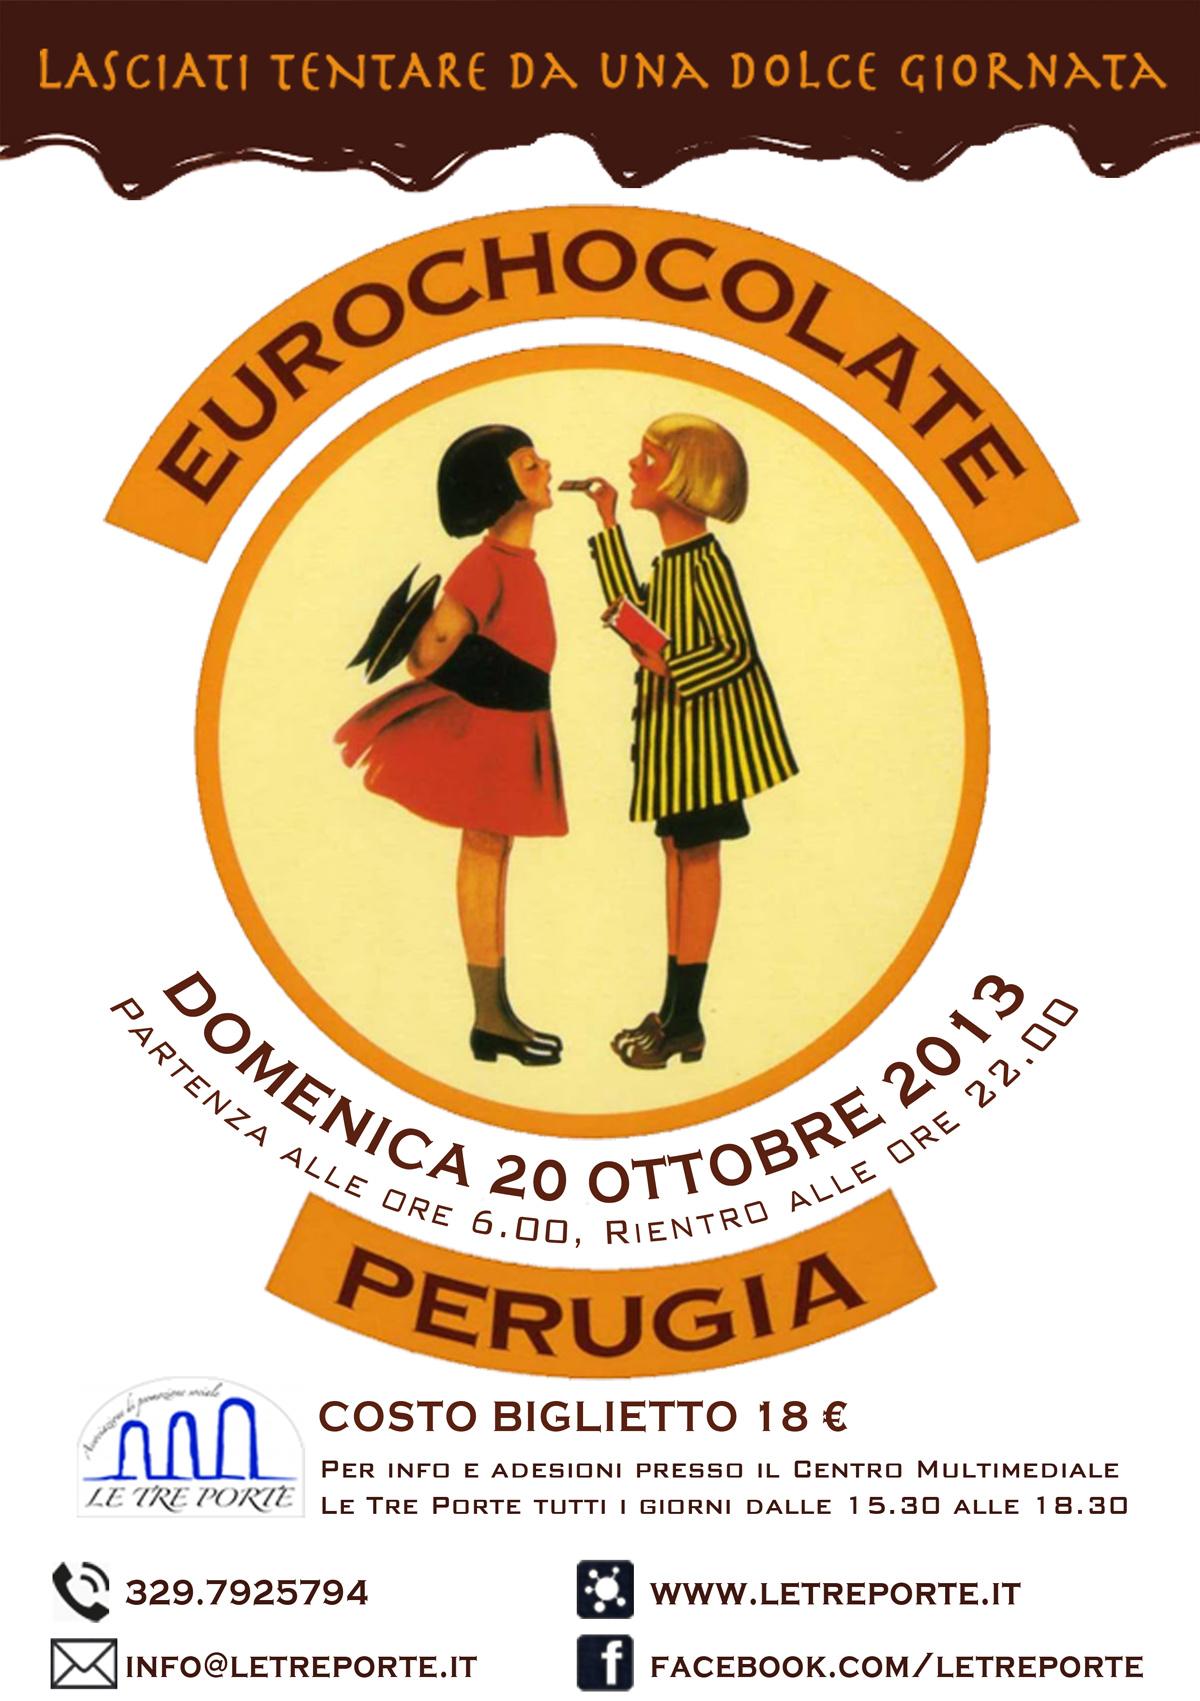 Giornata a Eurochocolate a Perugia